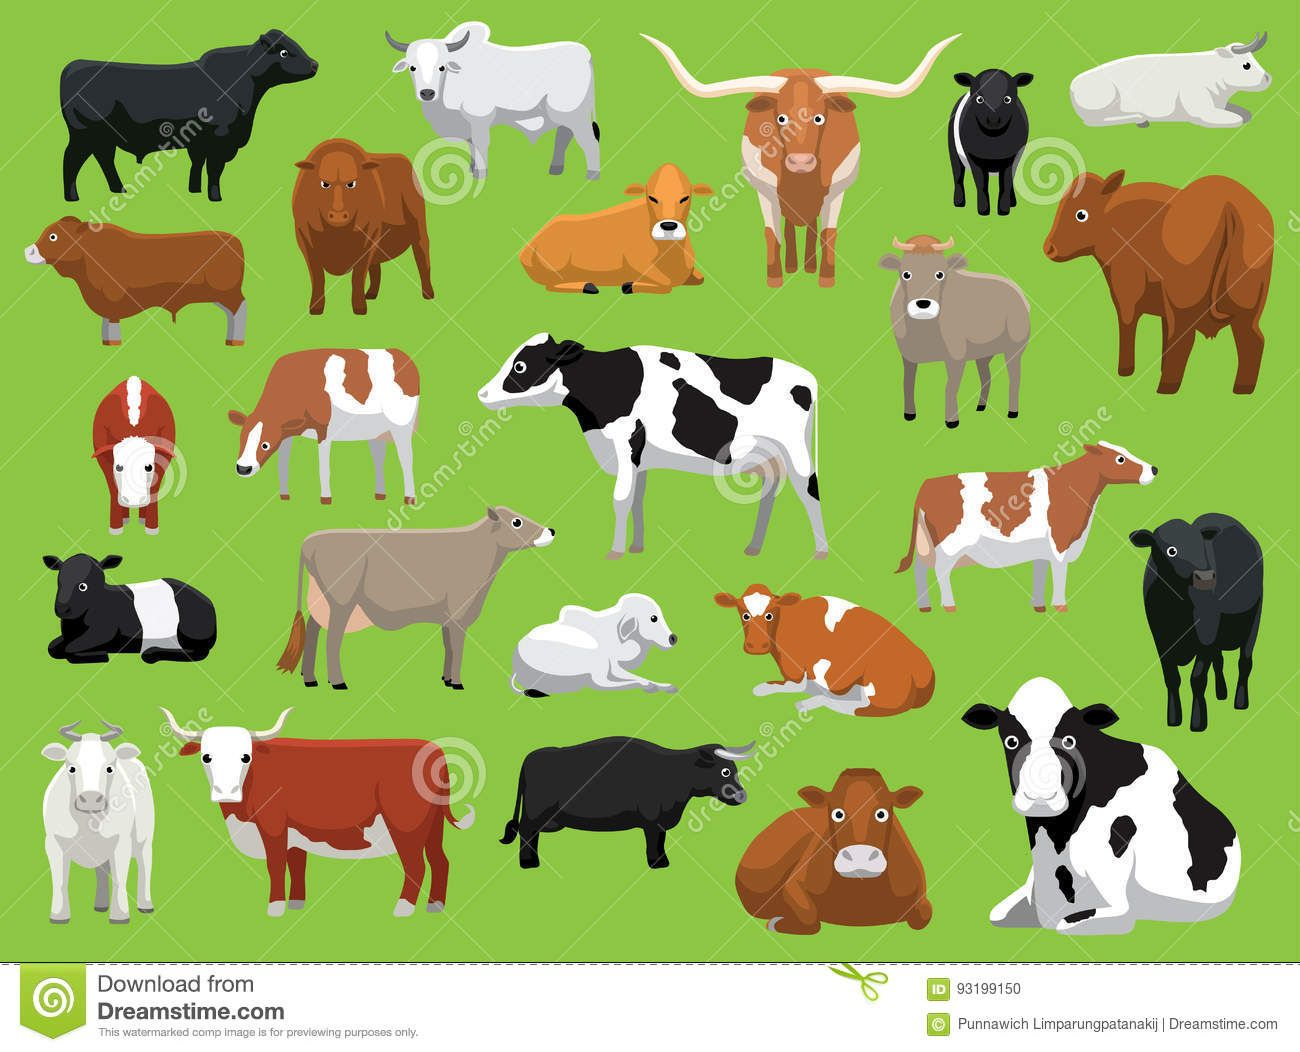 Photo about Animal Cartoon EPS10 File Format. Illustration